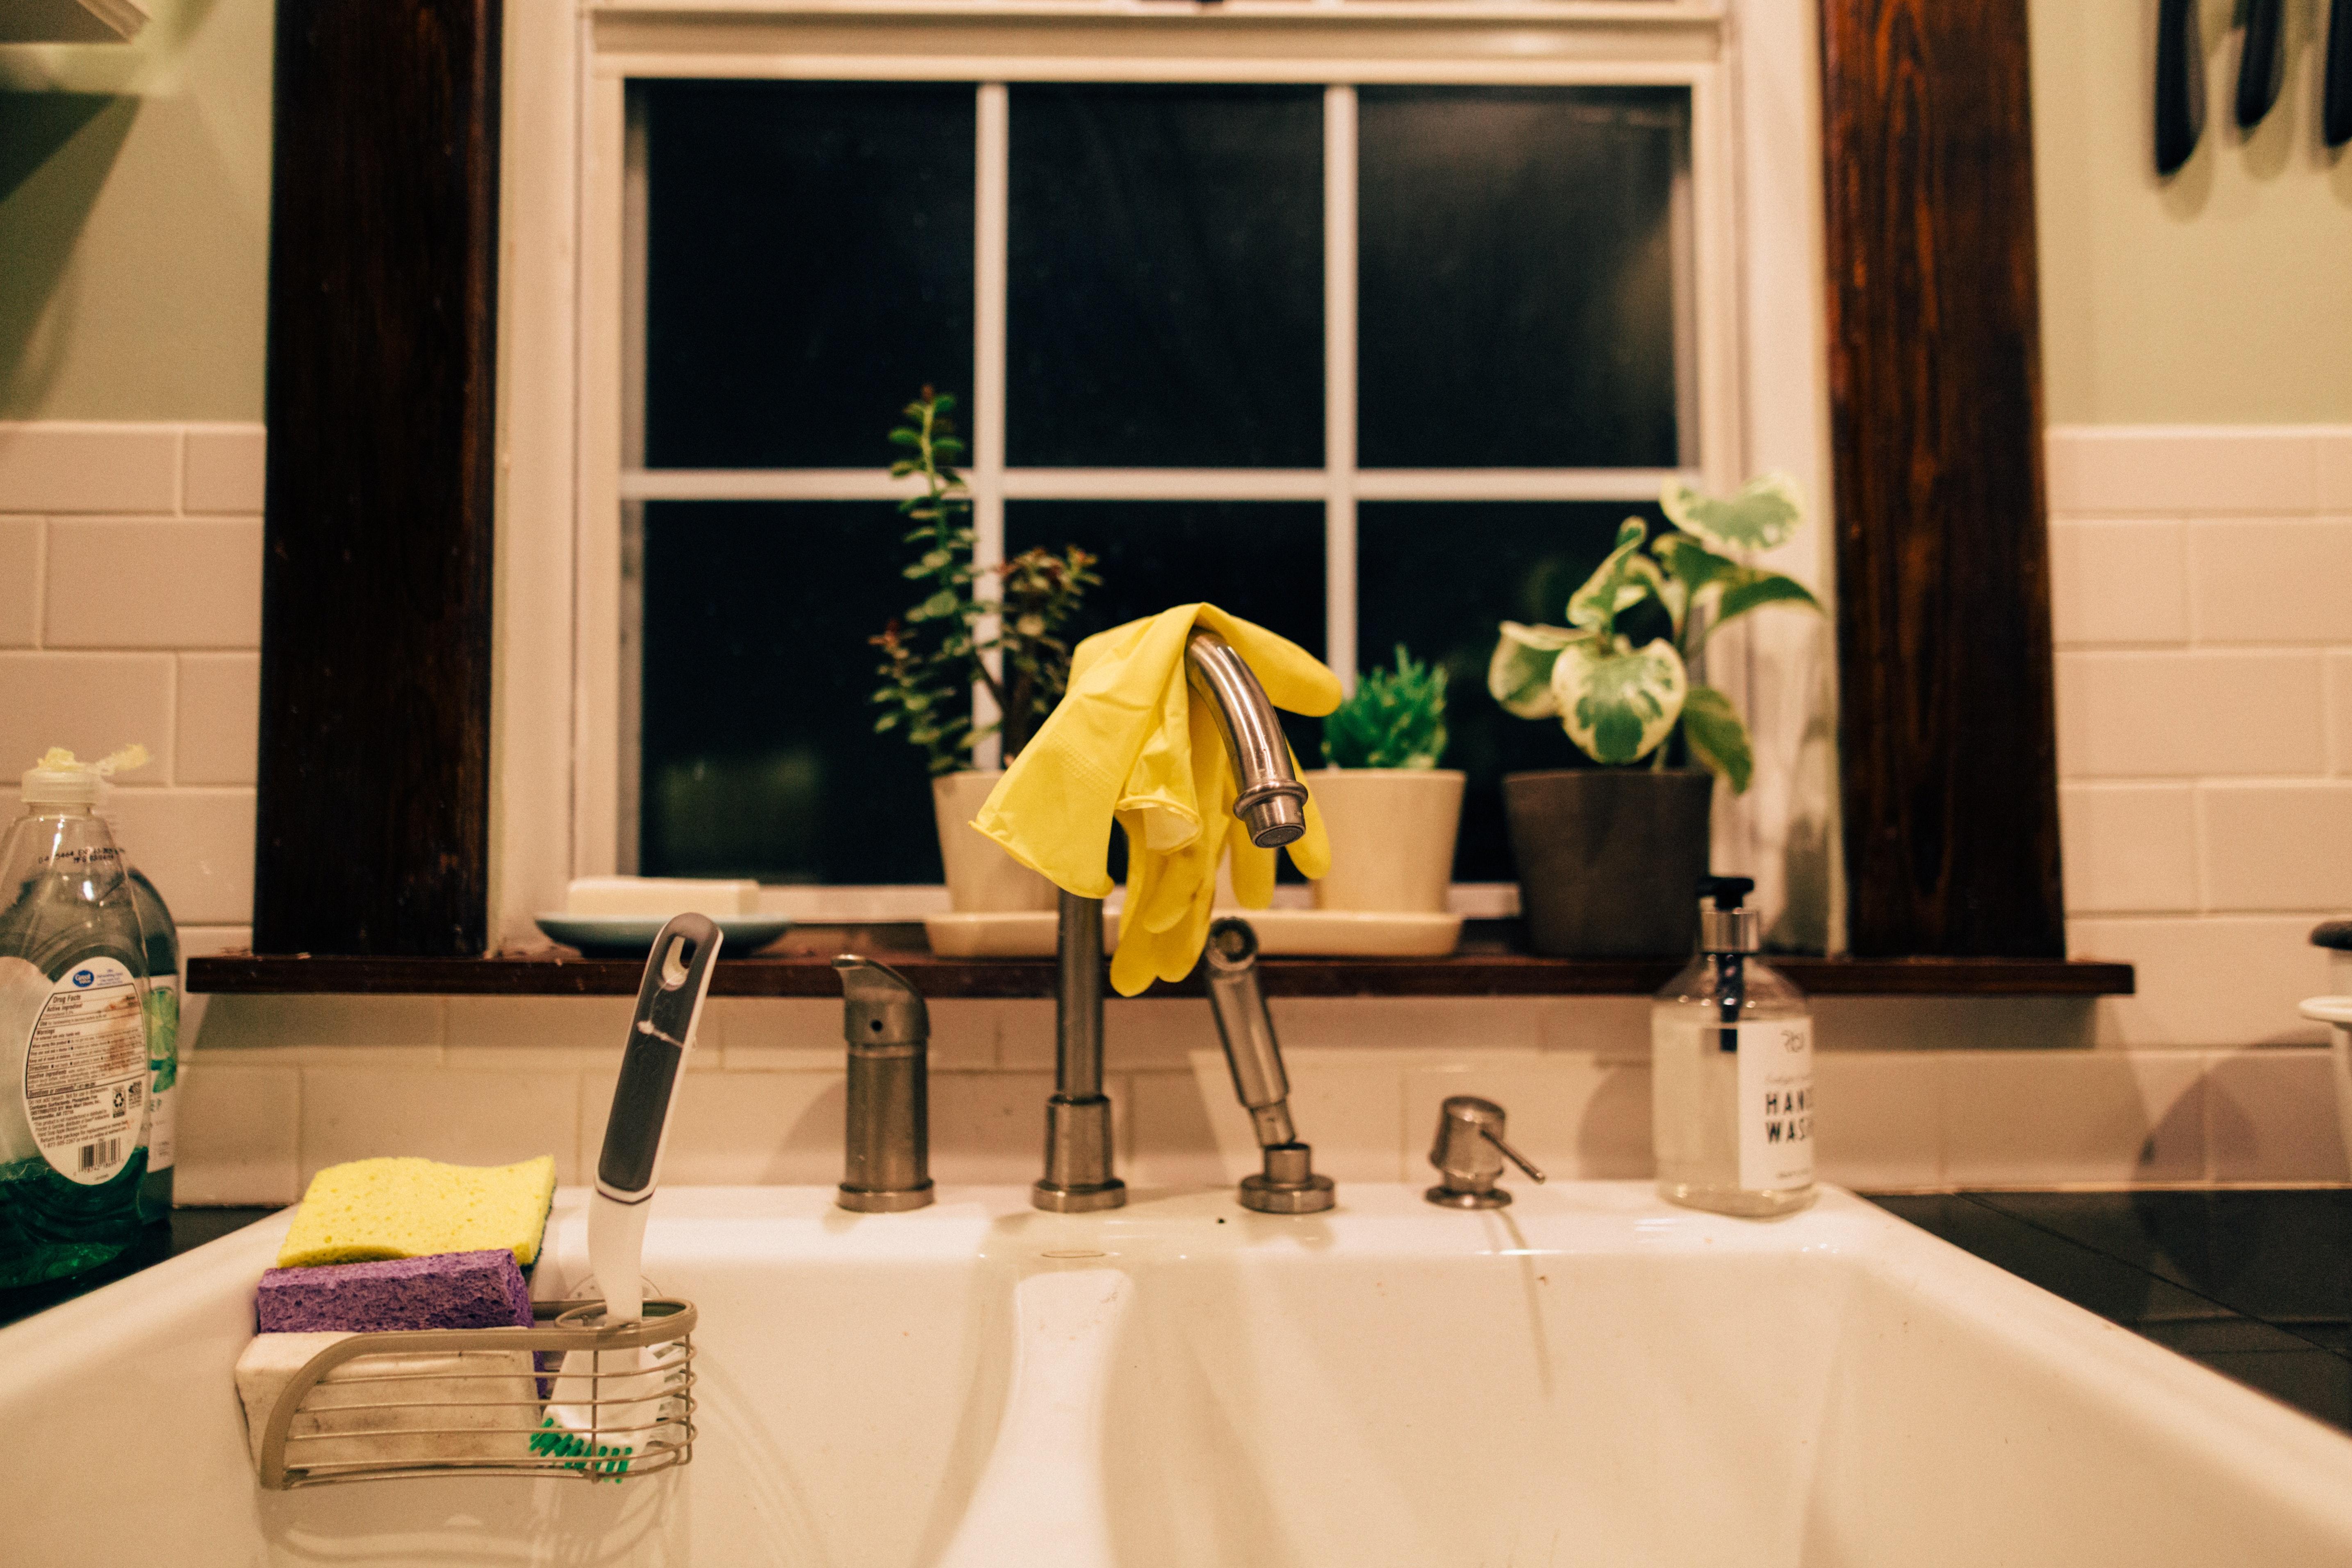 dishwashing gloves in the sink